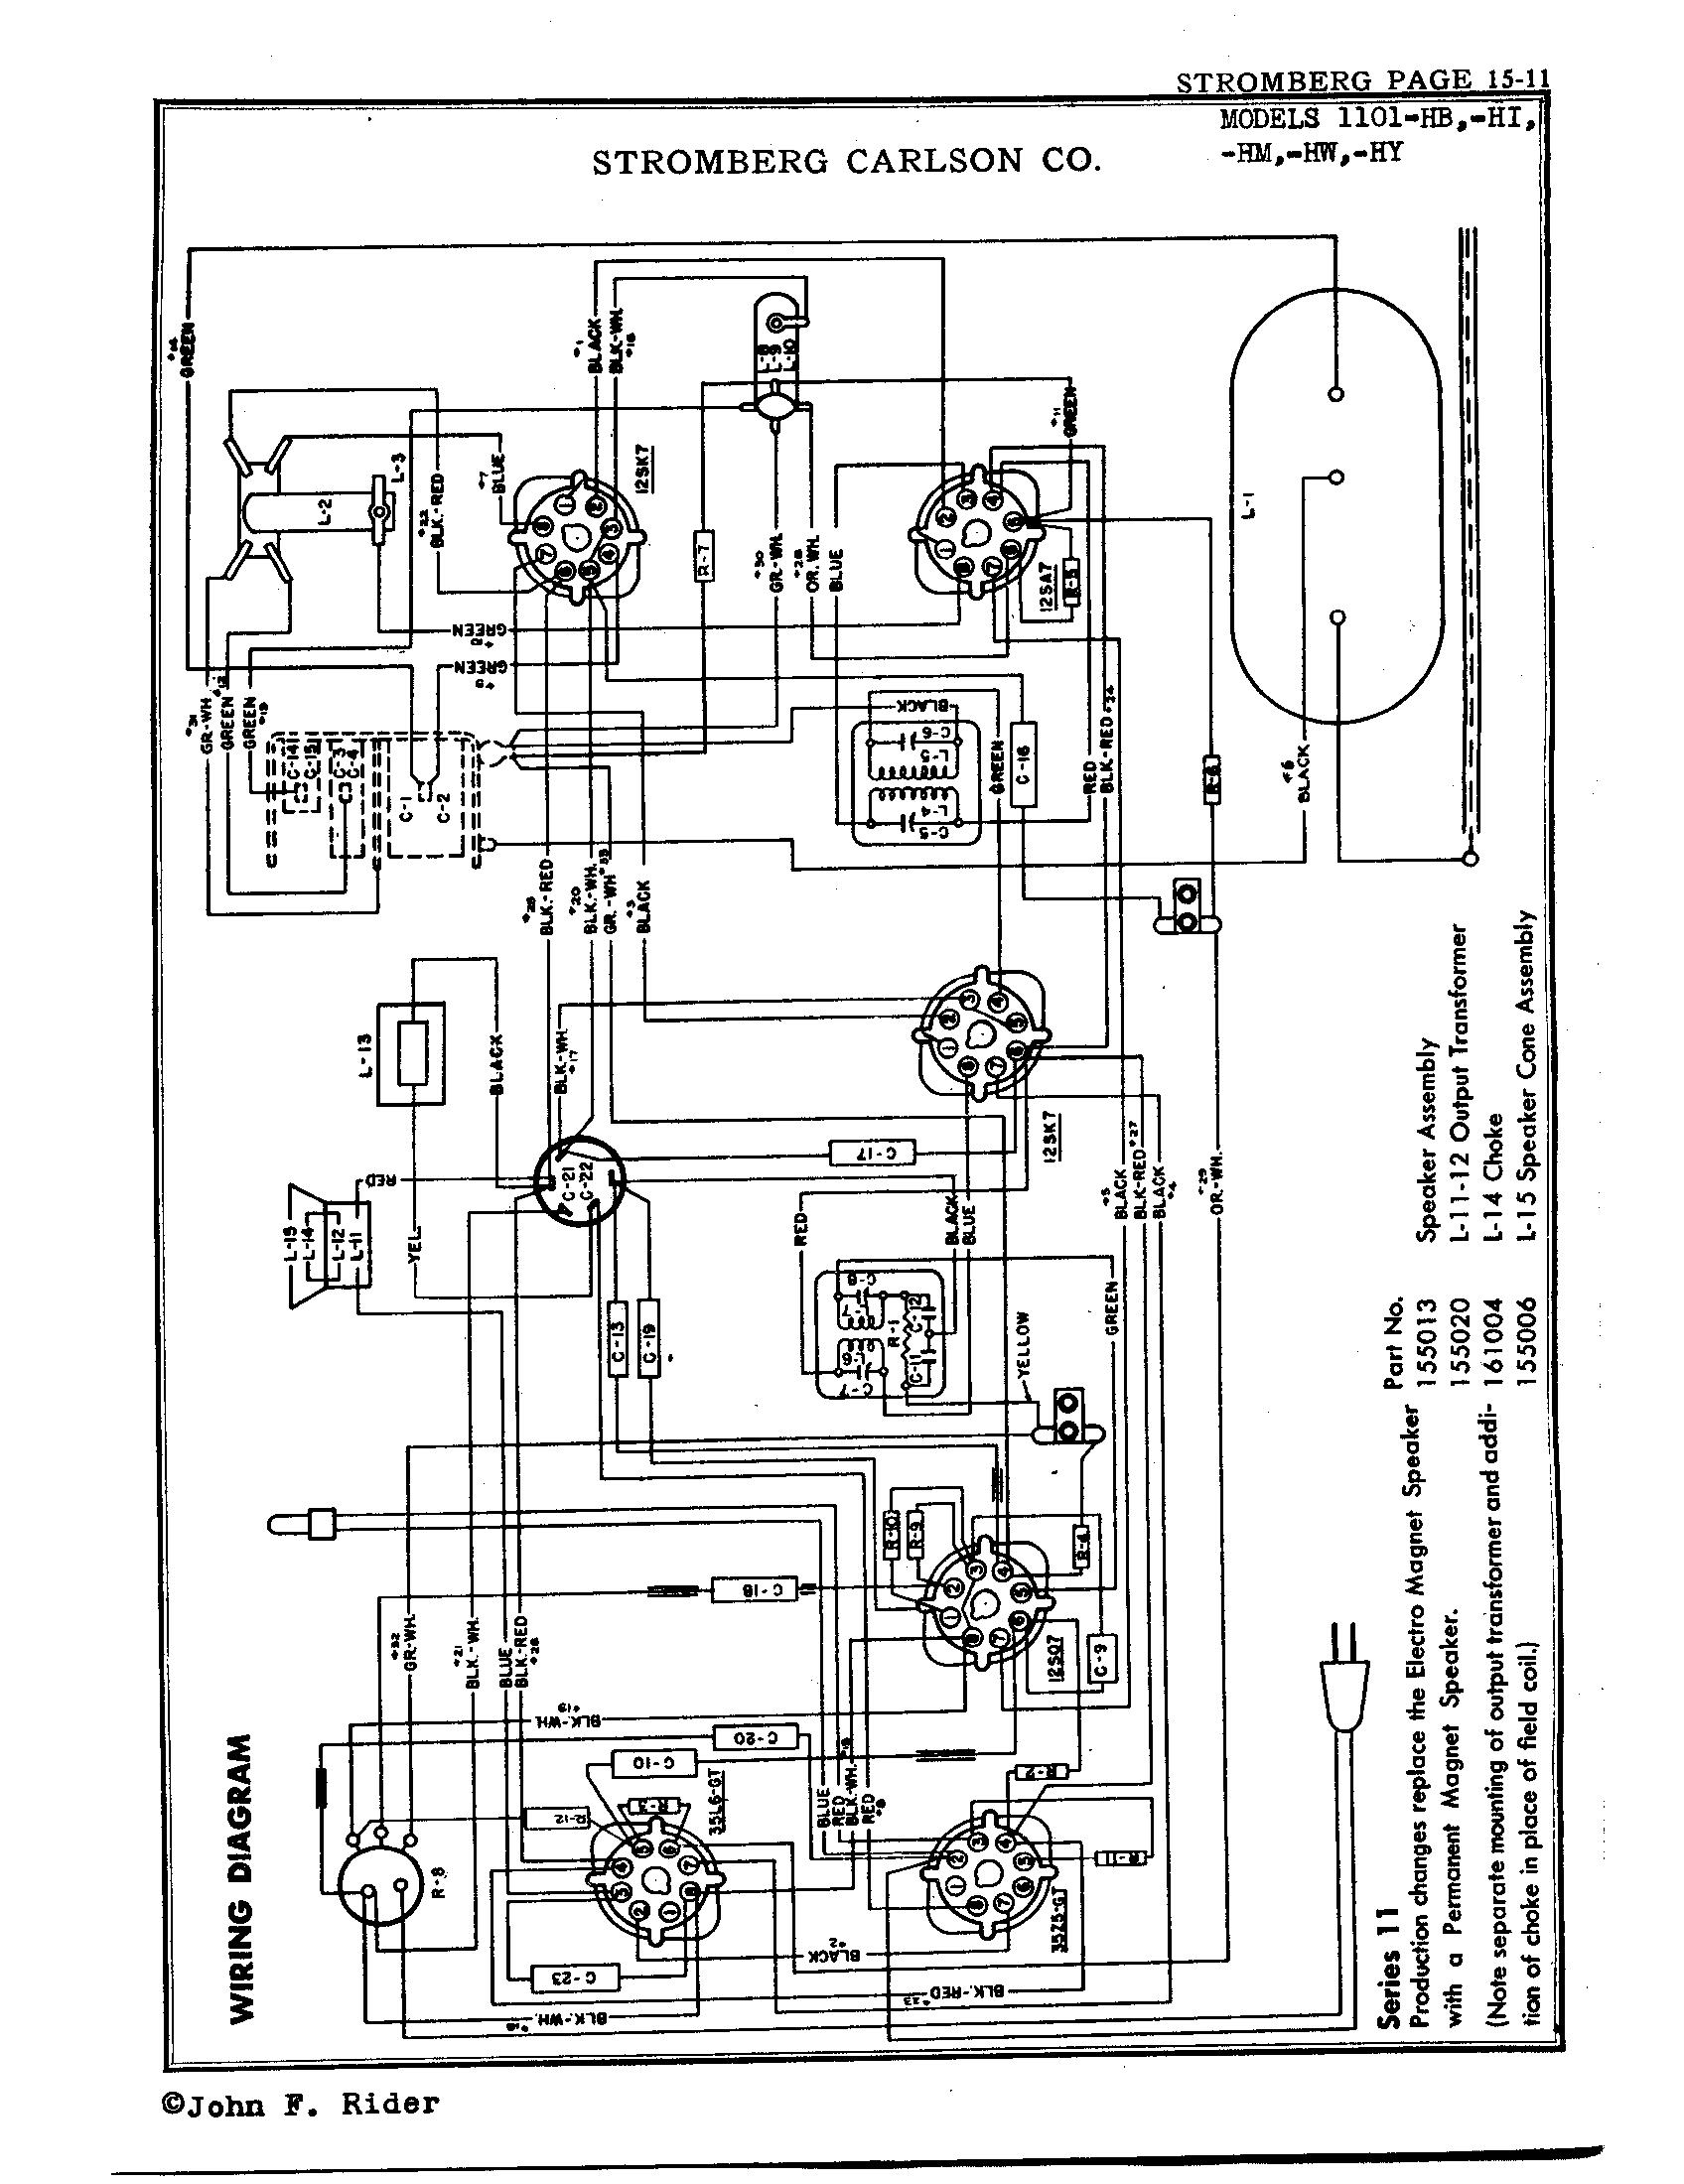 stromberg carlson co  1101